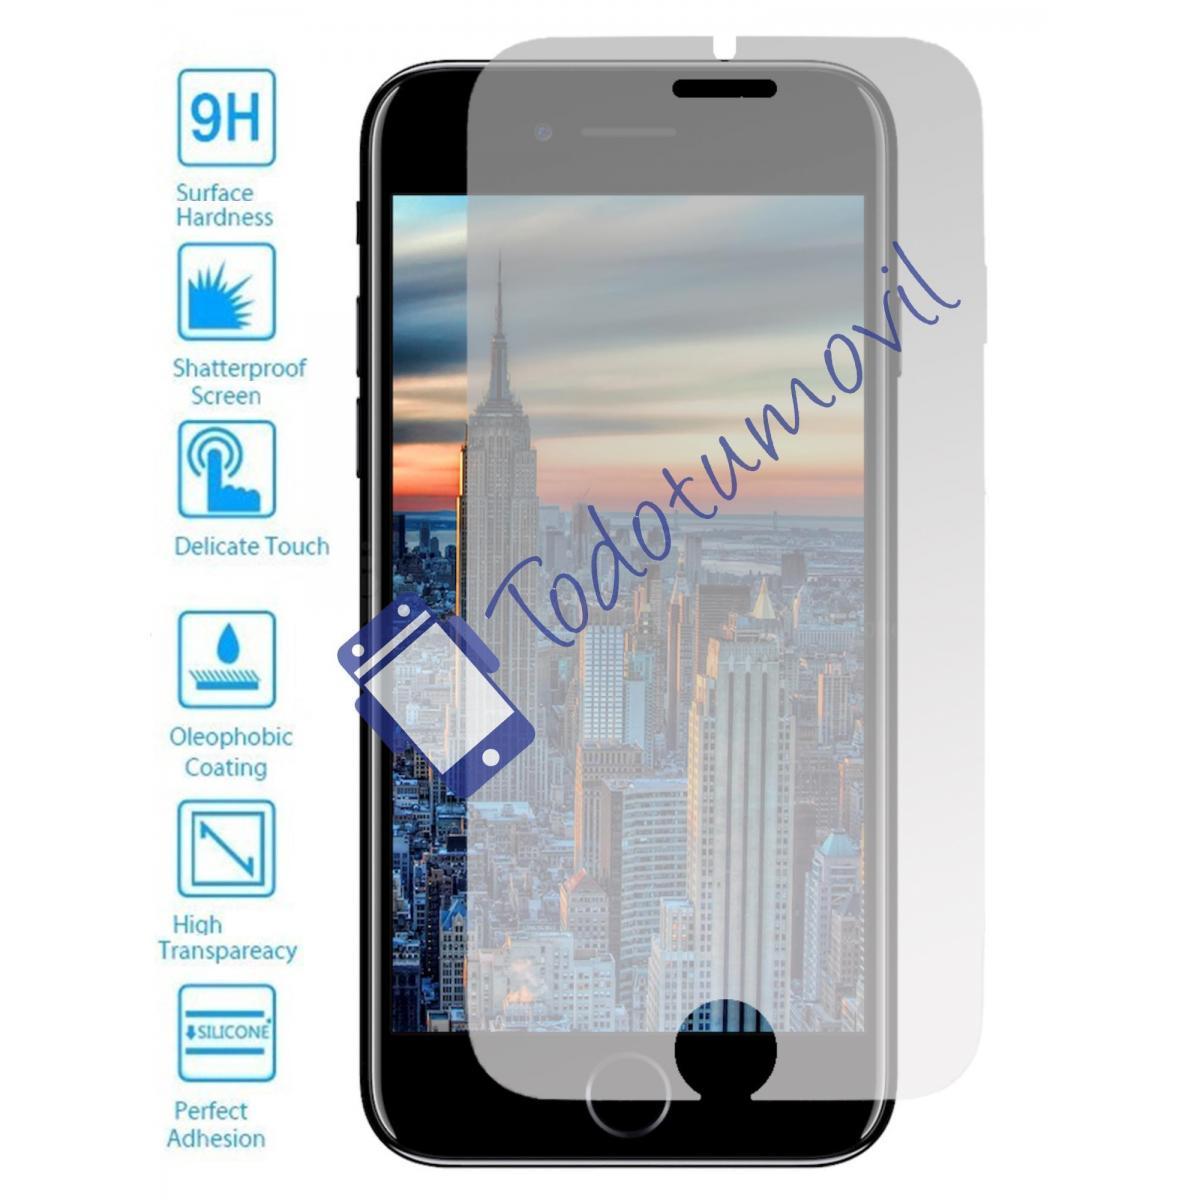 8146d9ad097 Protector de Pantalla Cristal Templado Vidrio 9H para movil Iphone Elige  Modelo